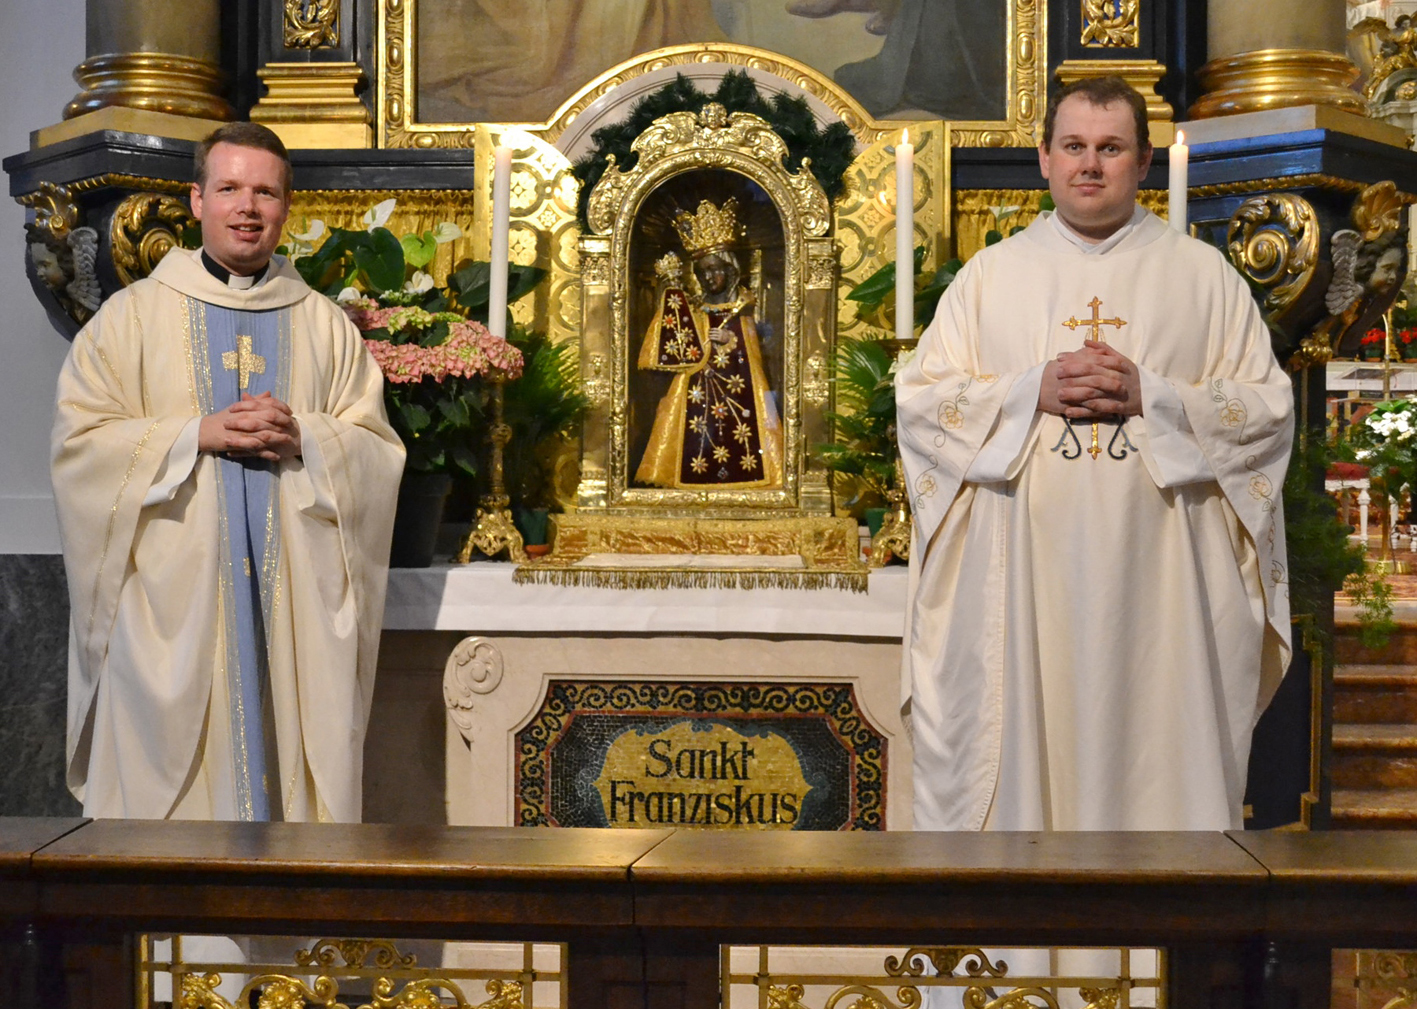 2020 07 03 neupriester in altoetting dankwallfahrt1